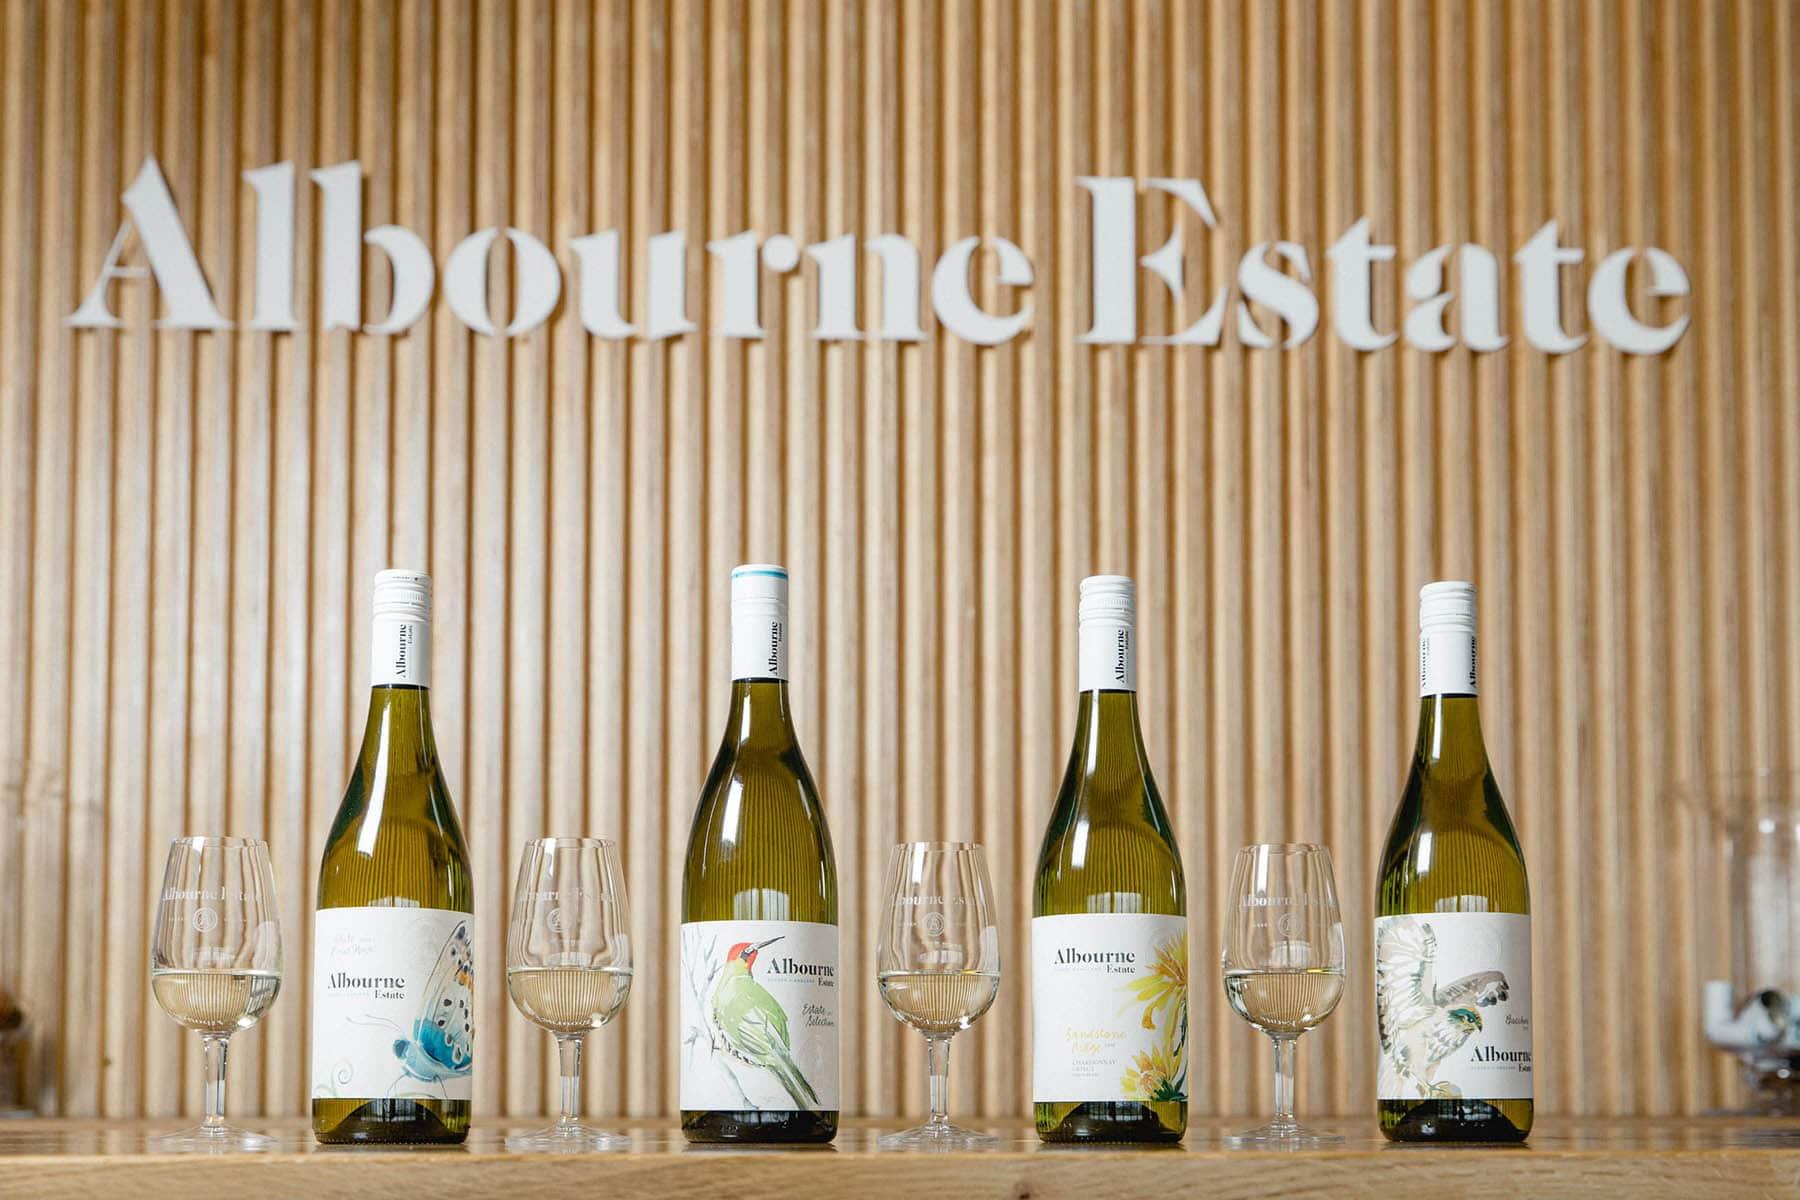 Albourne Estate - Sussex Vineyard - English white wines